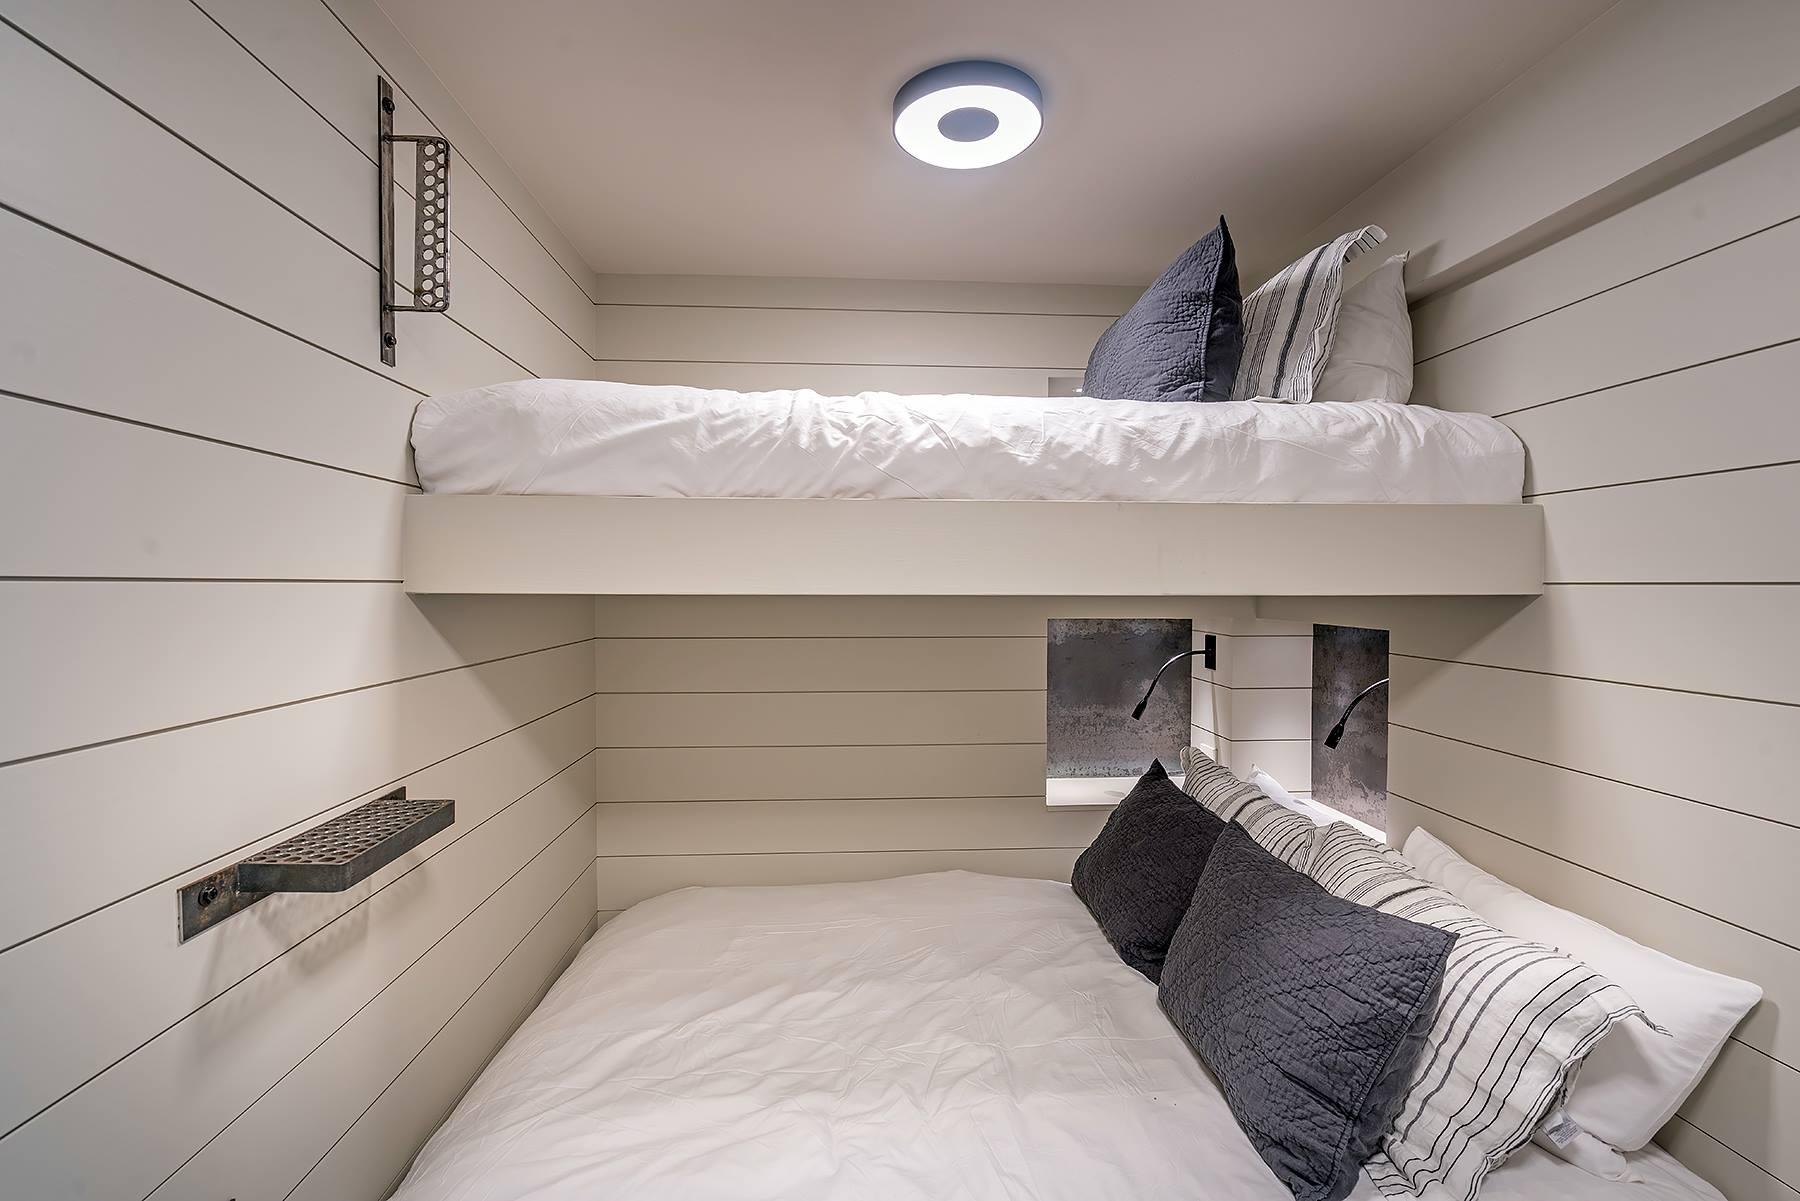 131 bunk.jpg